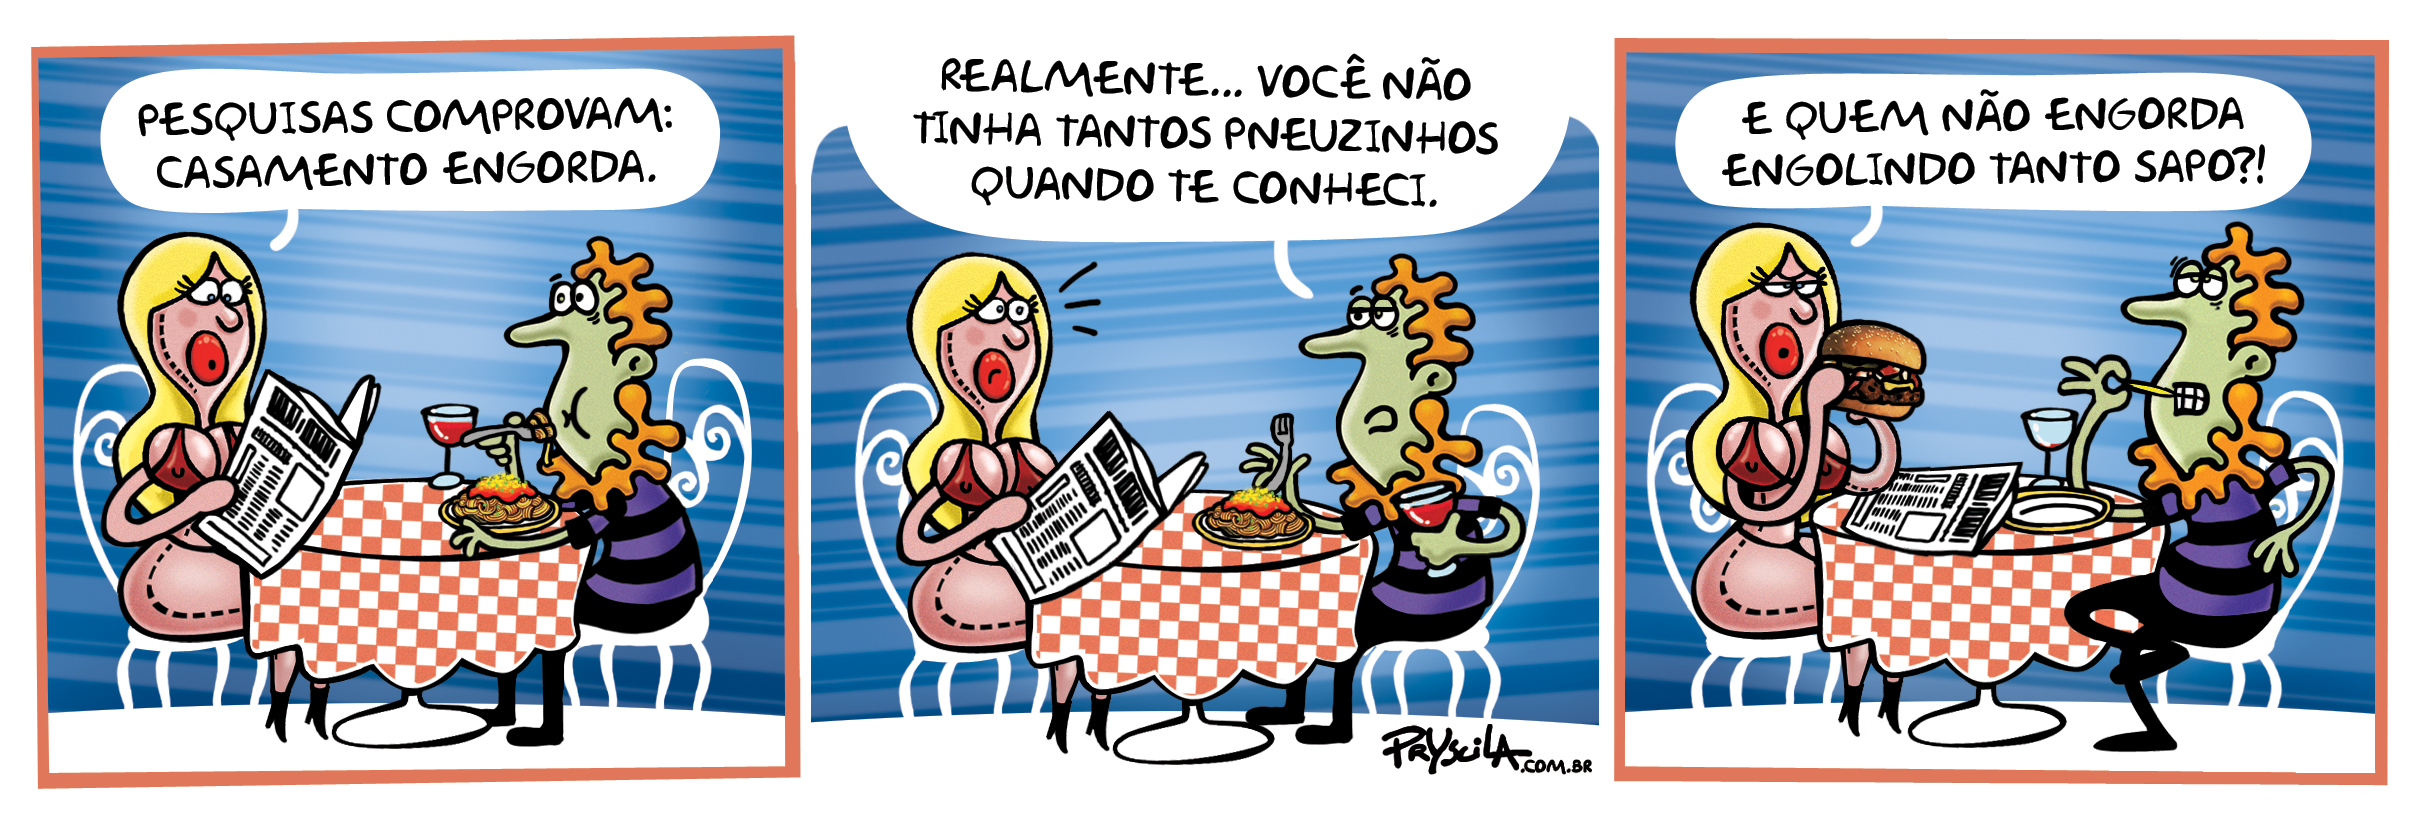 tirinha_pryscila_dieta